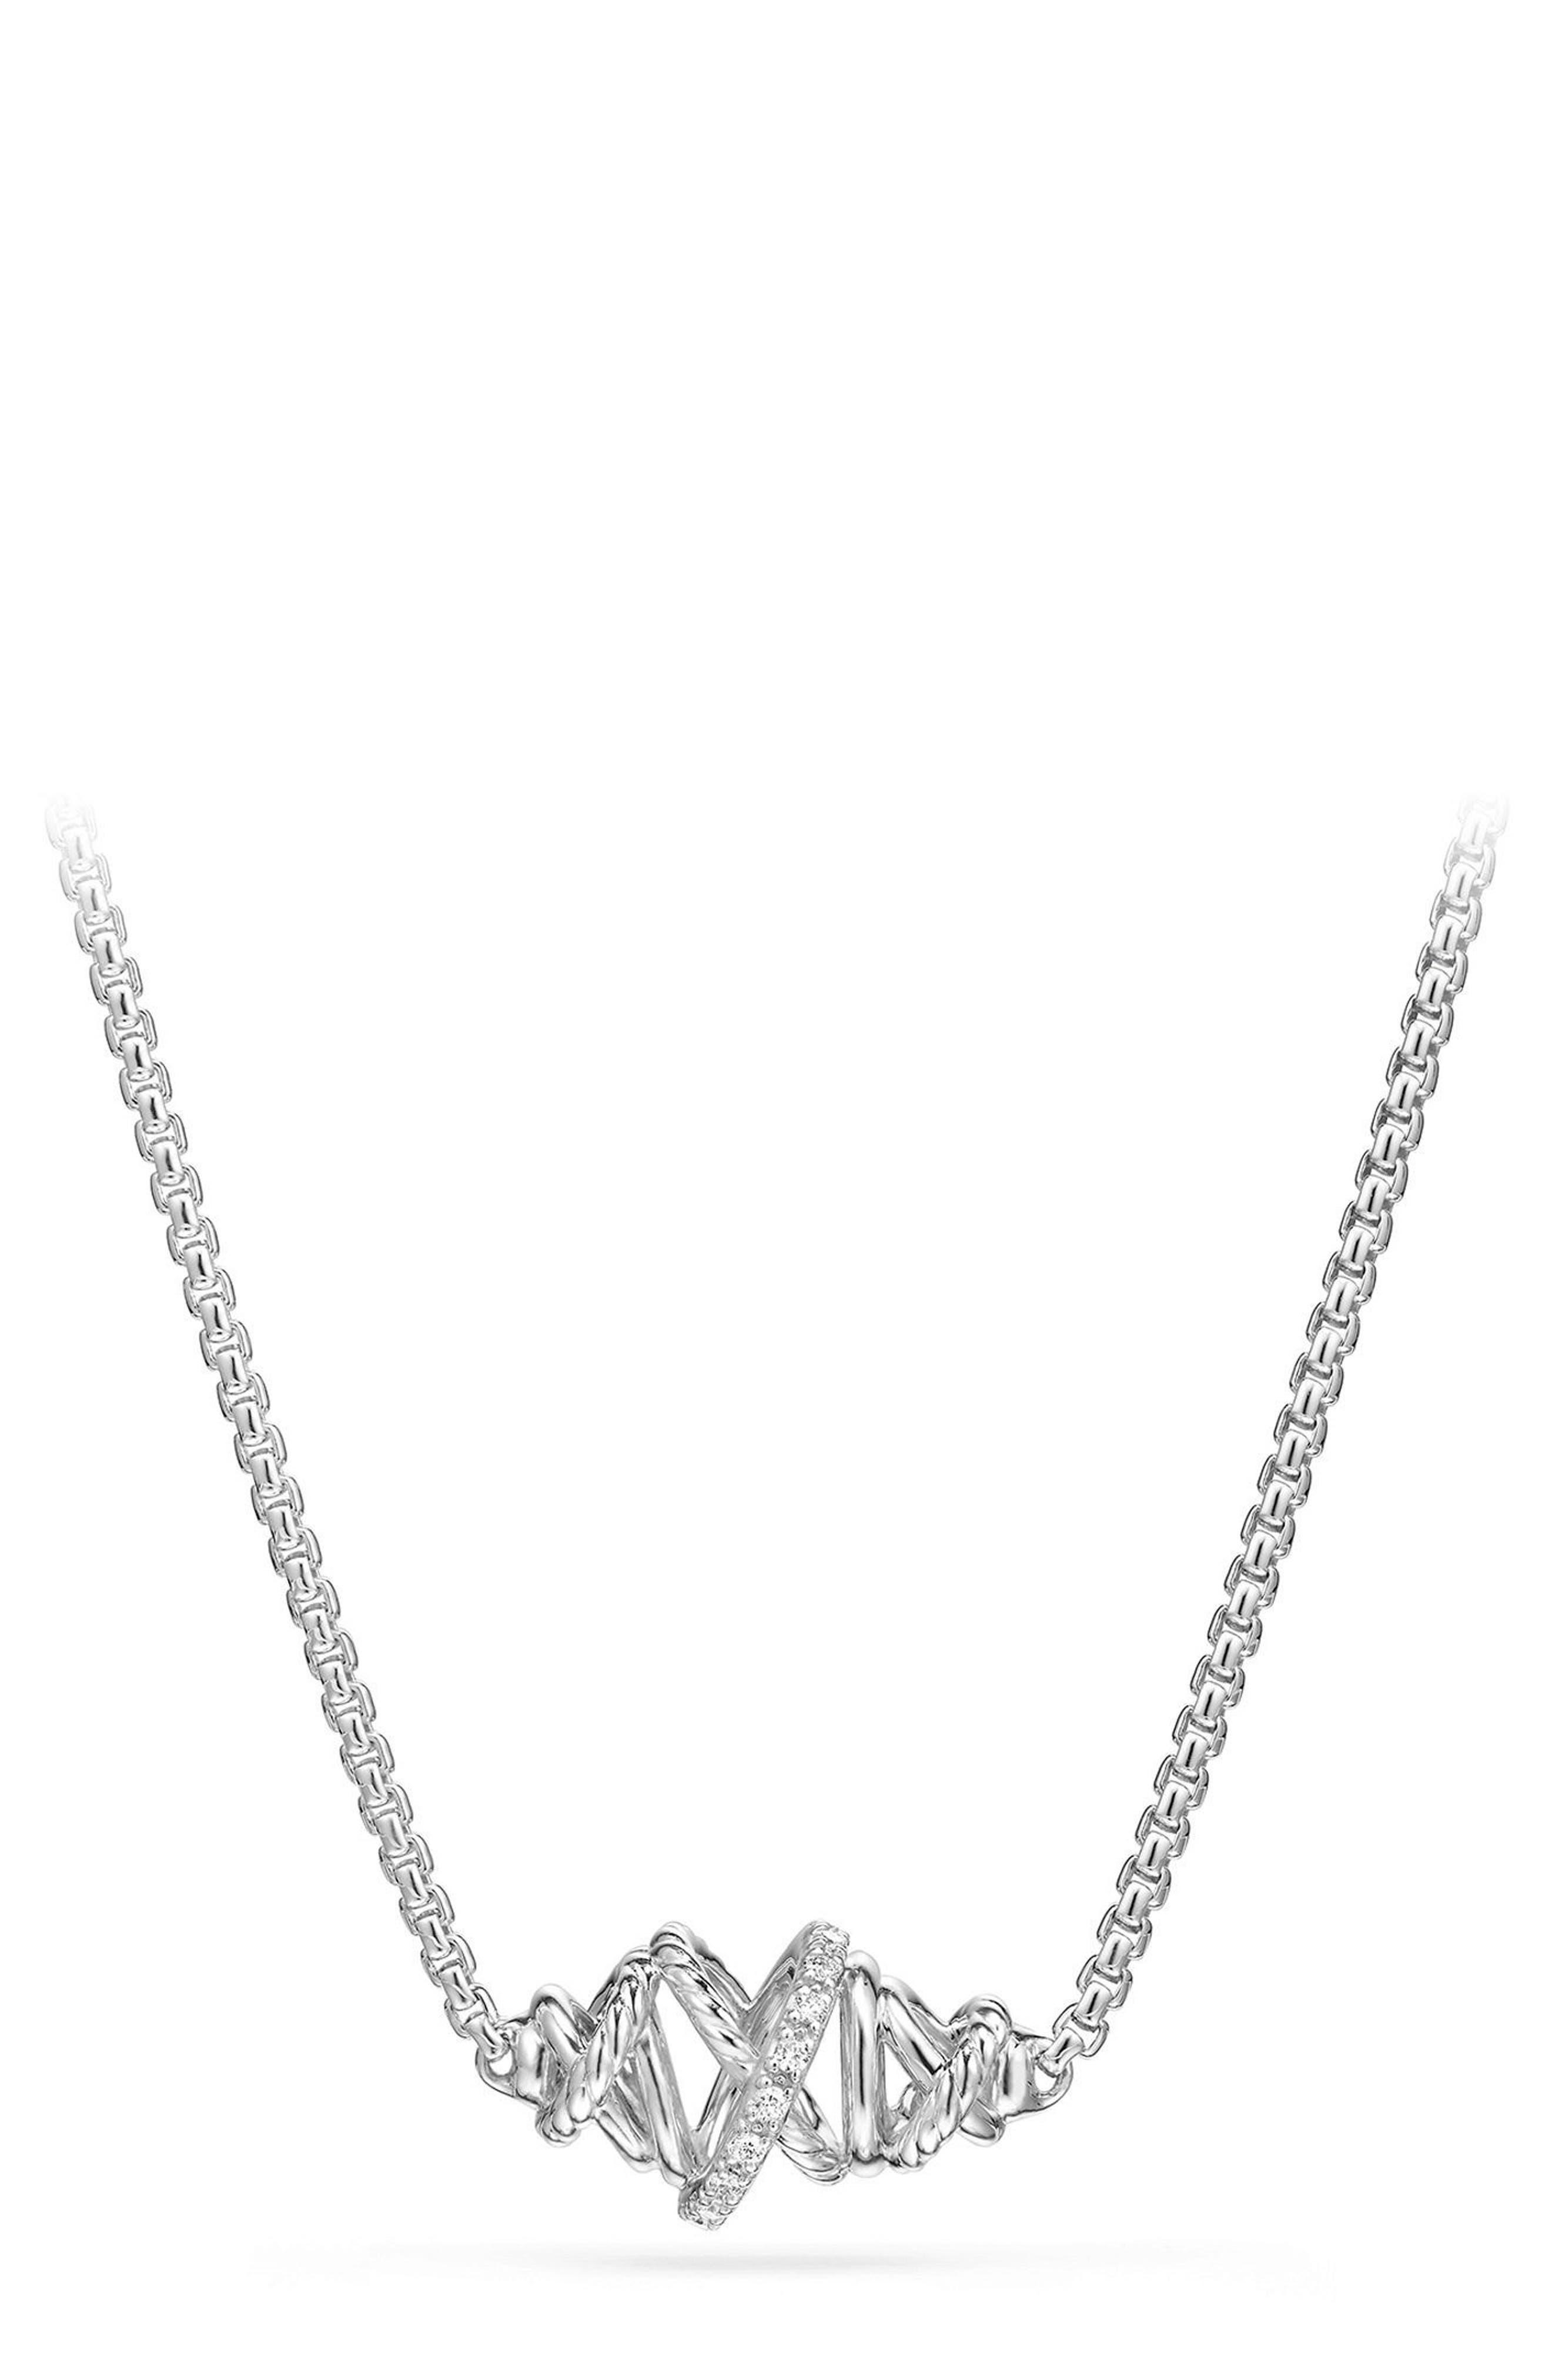 Main Image - David Yurman Crossover Single Station Necklace with Diamonds